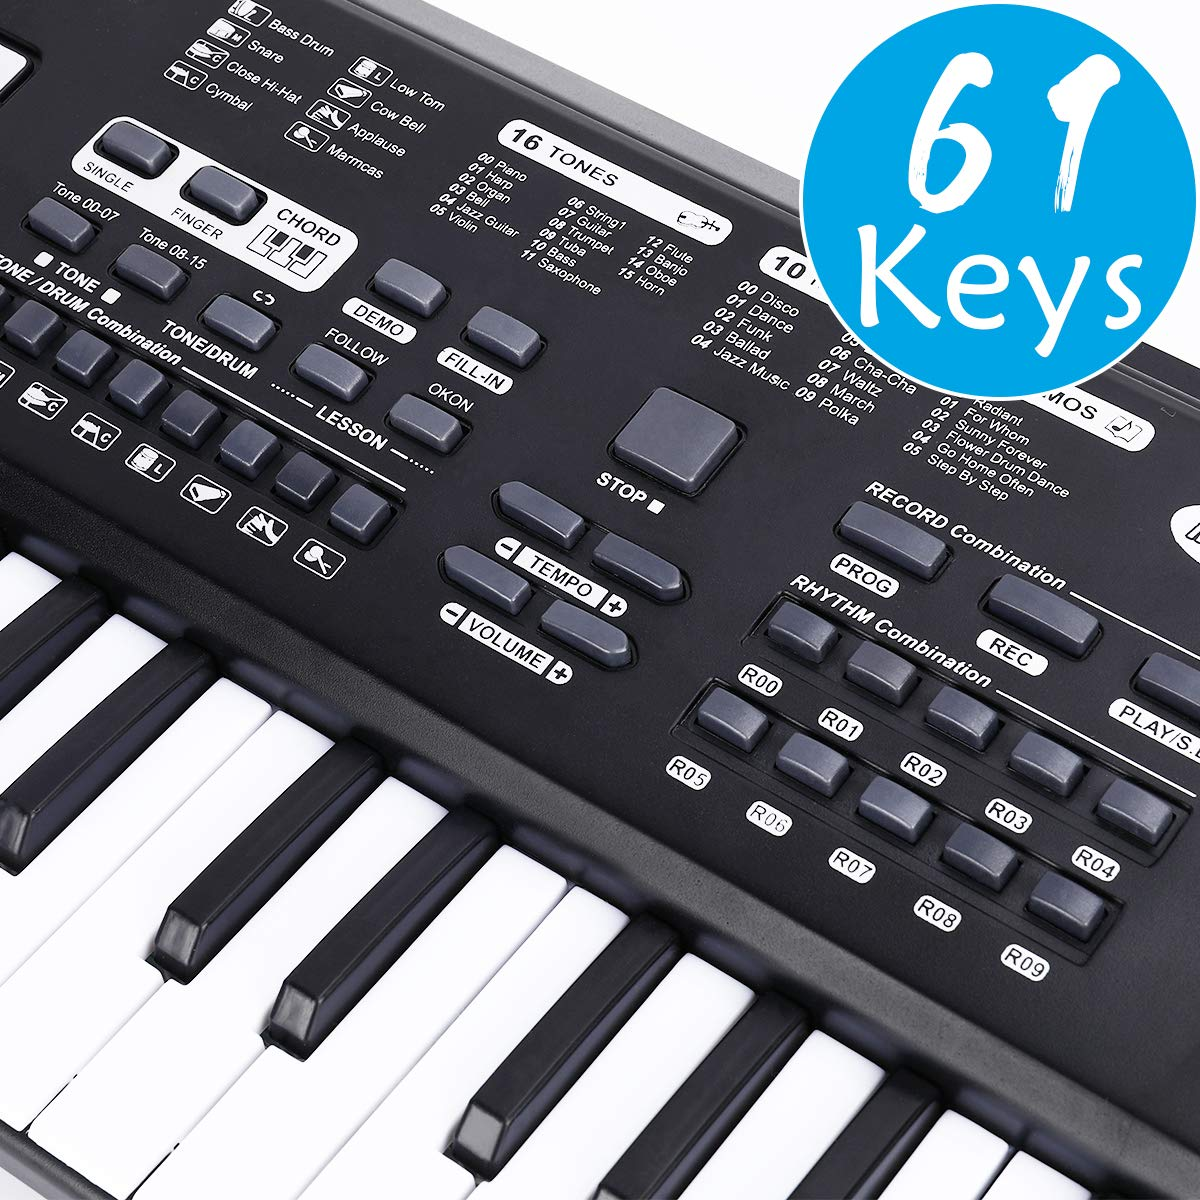 WOSTOO 61 Key Piano Keyboard Portable Electronic Kids Piano Keyboard  Beginner Digital Music Piano Keyboard & Microphone Teaching Toy Gift for  Kids Boy